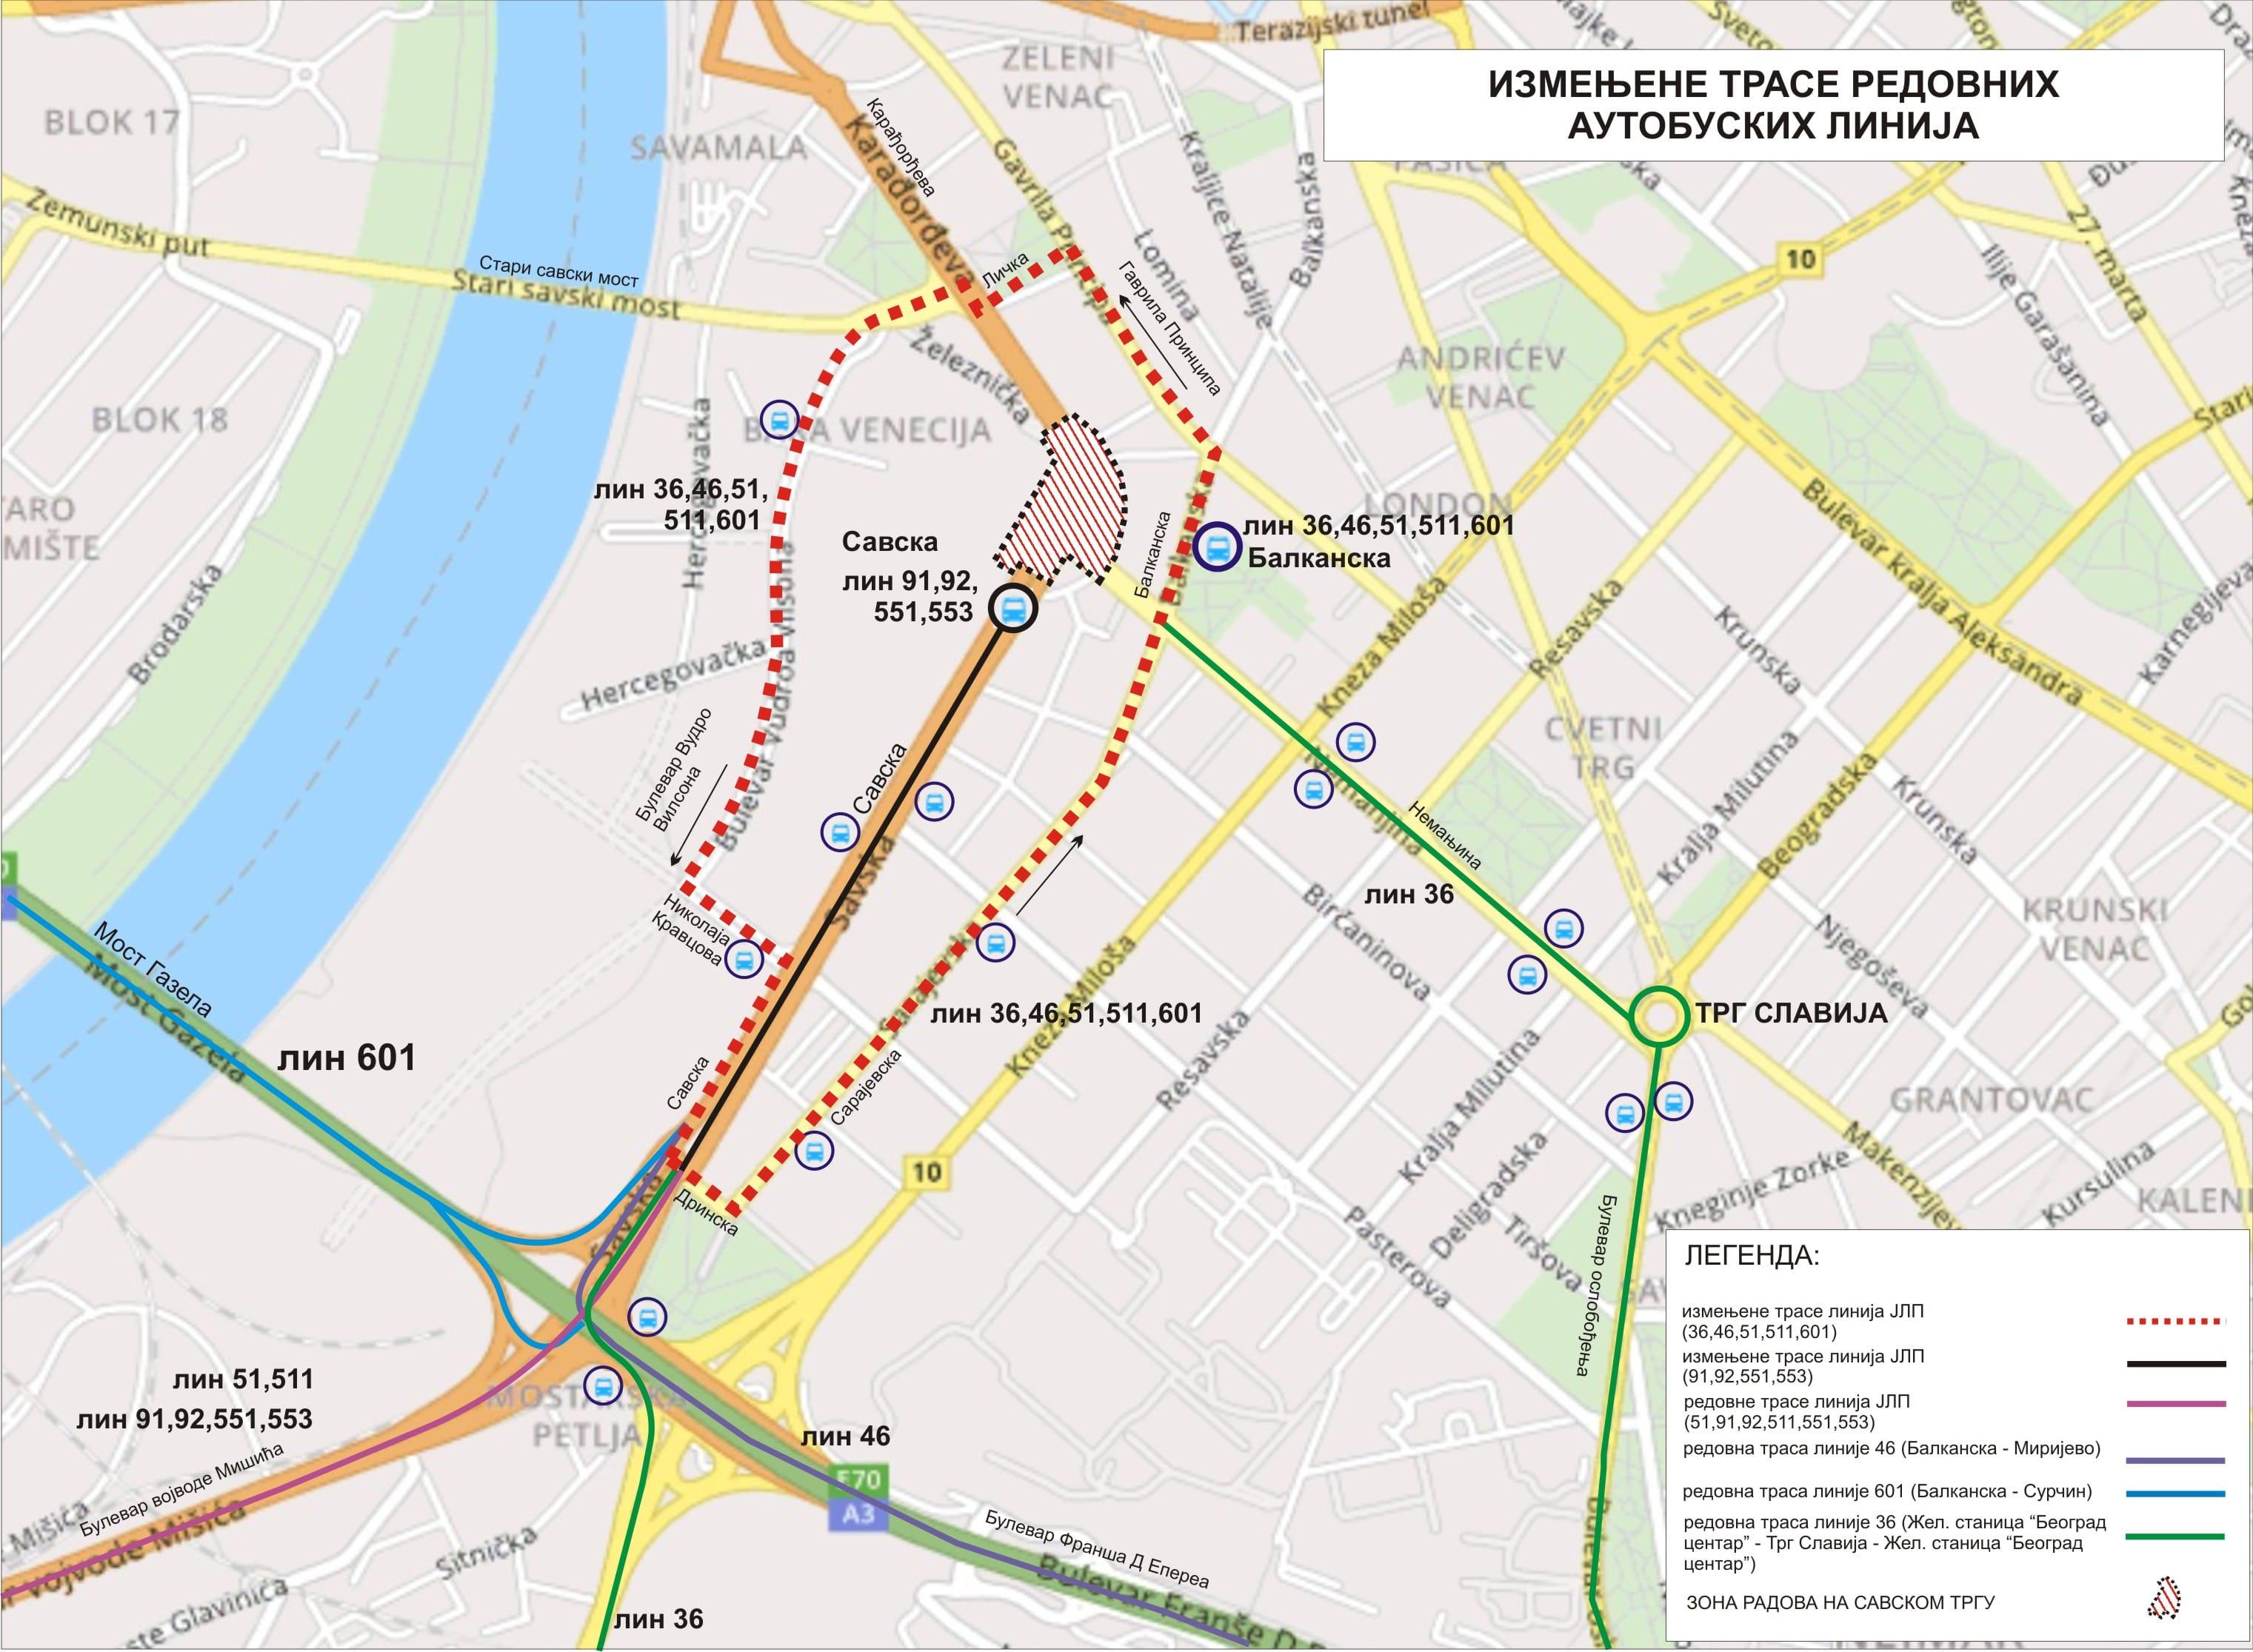 Mapa - Trase izmena redovnih linija zbog radova na Savskom trgu (od 29.02.2020)